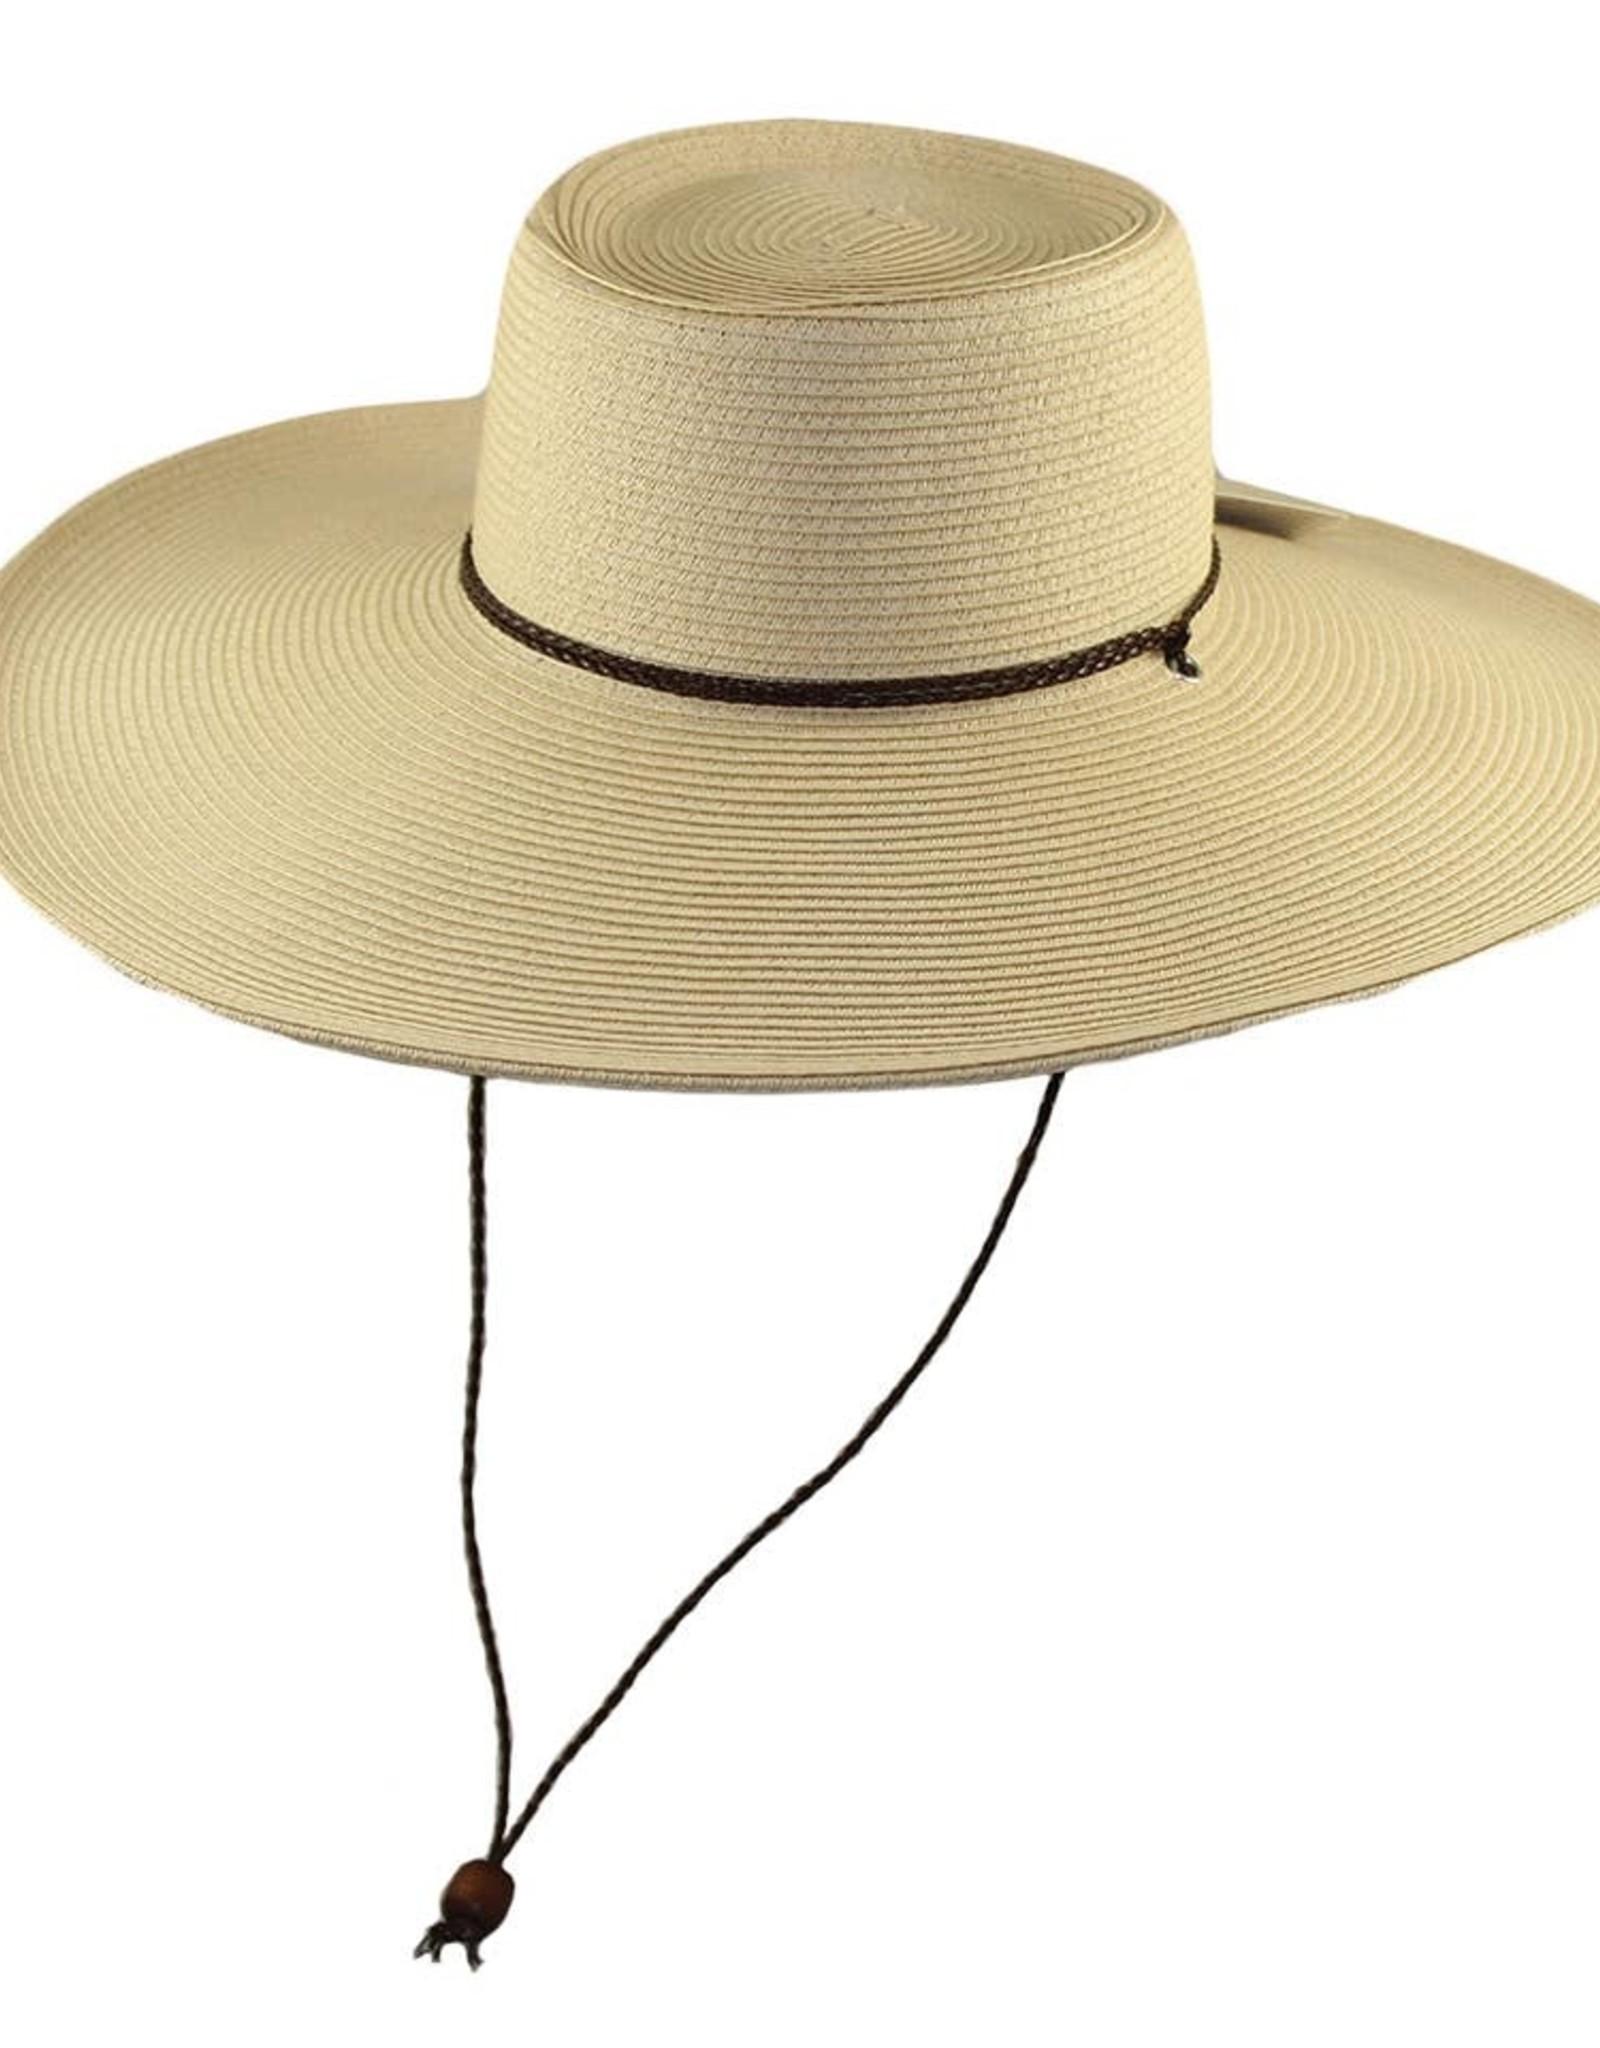 Paper Braid Large Brim Straw Hat w/ Chin Cord